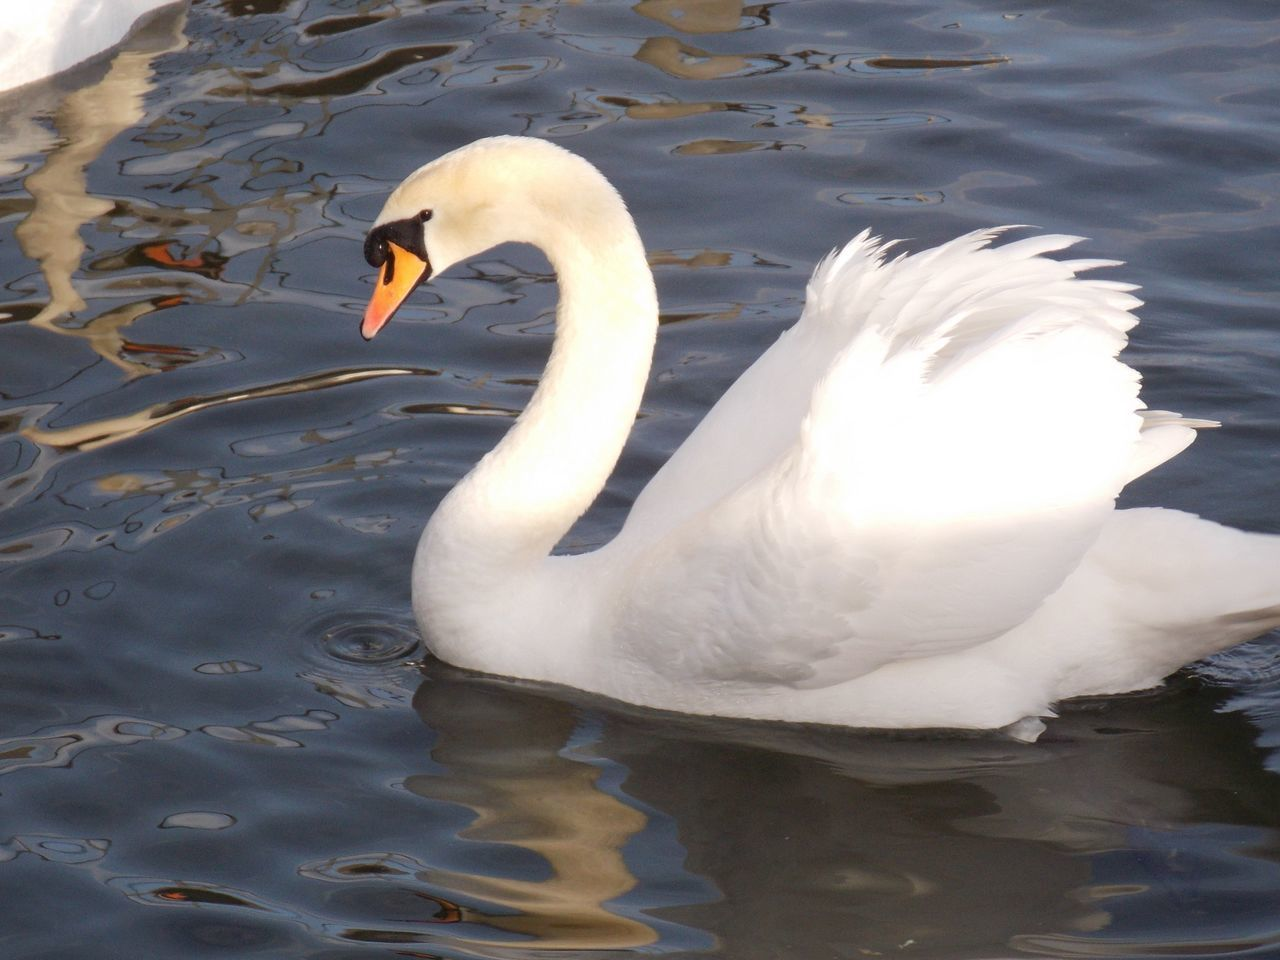 lake, swan, animal themes, animals in the wild, one animal, white color, water, bird, swimming, water bird, animal wildlife, no people, day, waterfront, nature, beak, outdoors, close-up